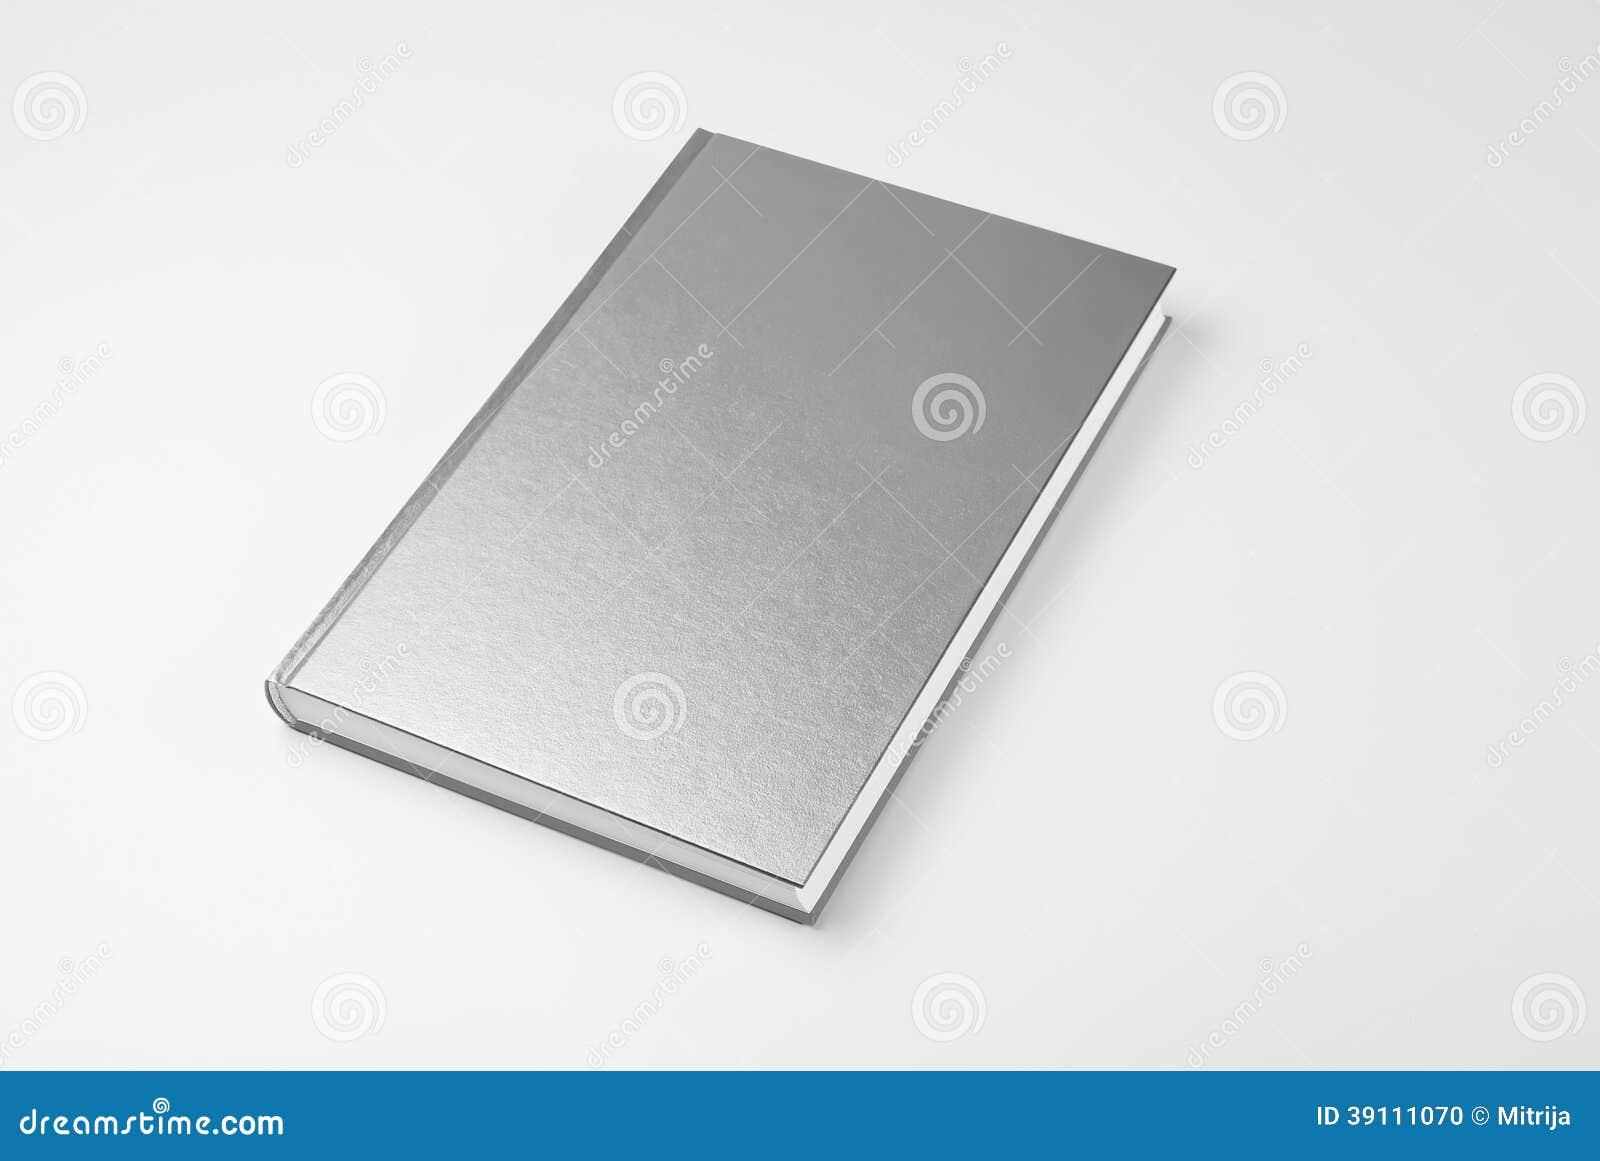 Blank closed book